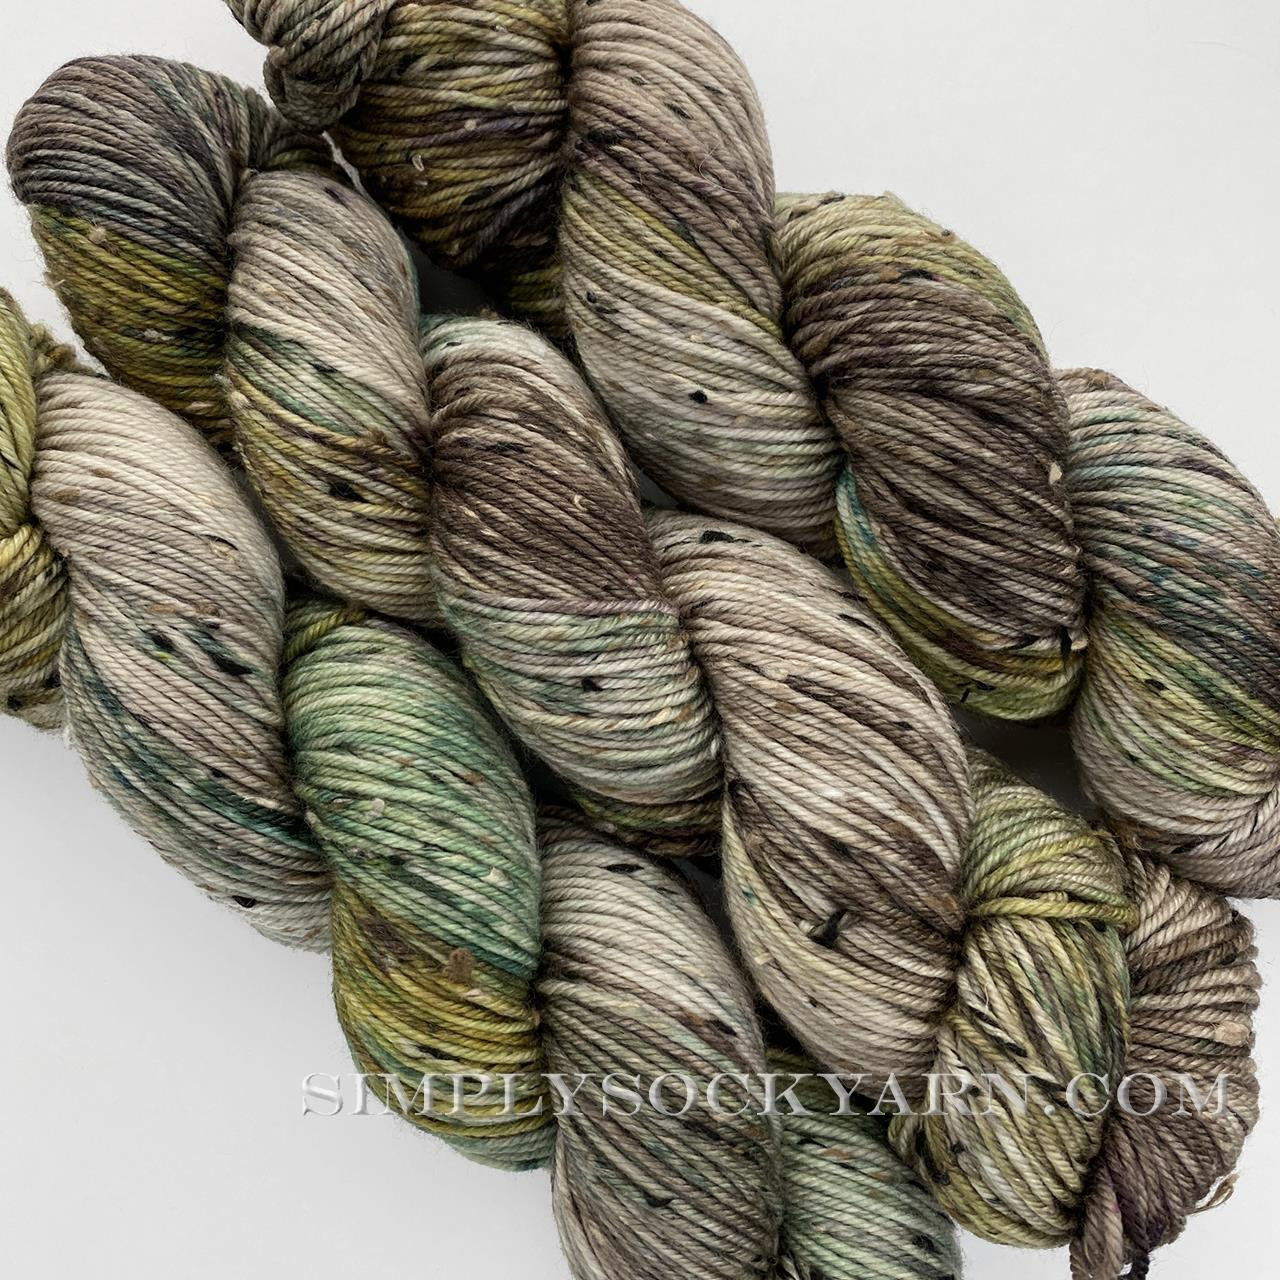 LTY Tweed DK Alluvium -